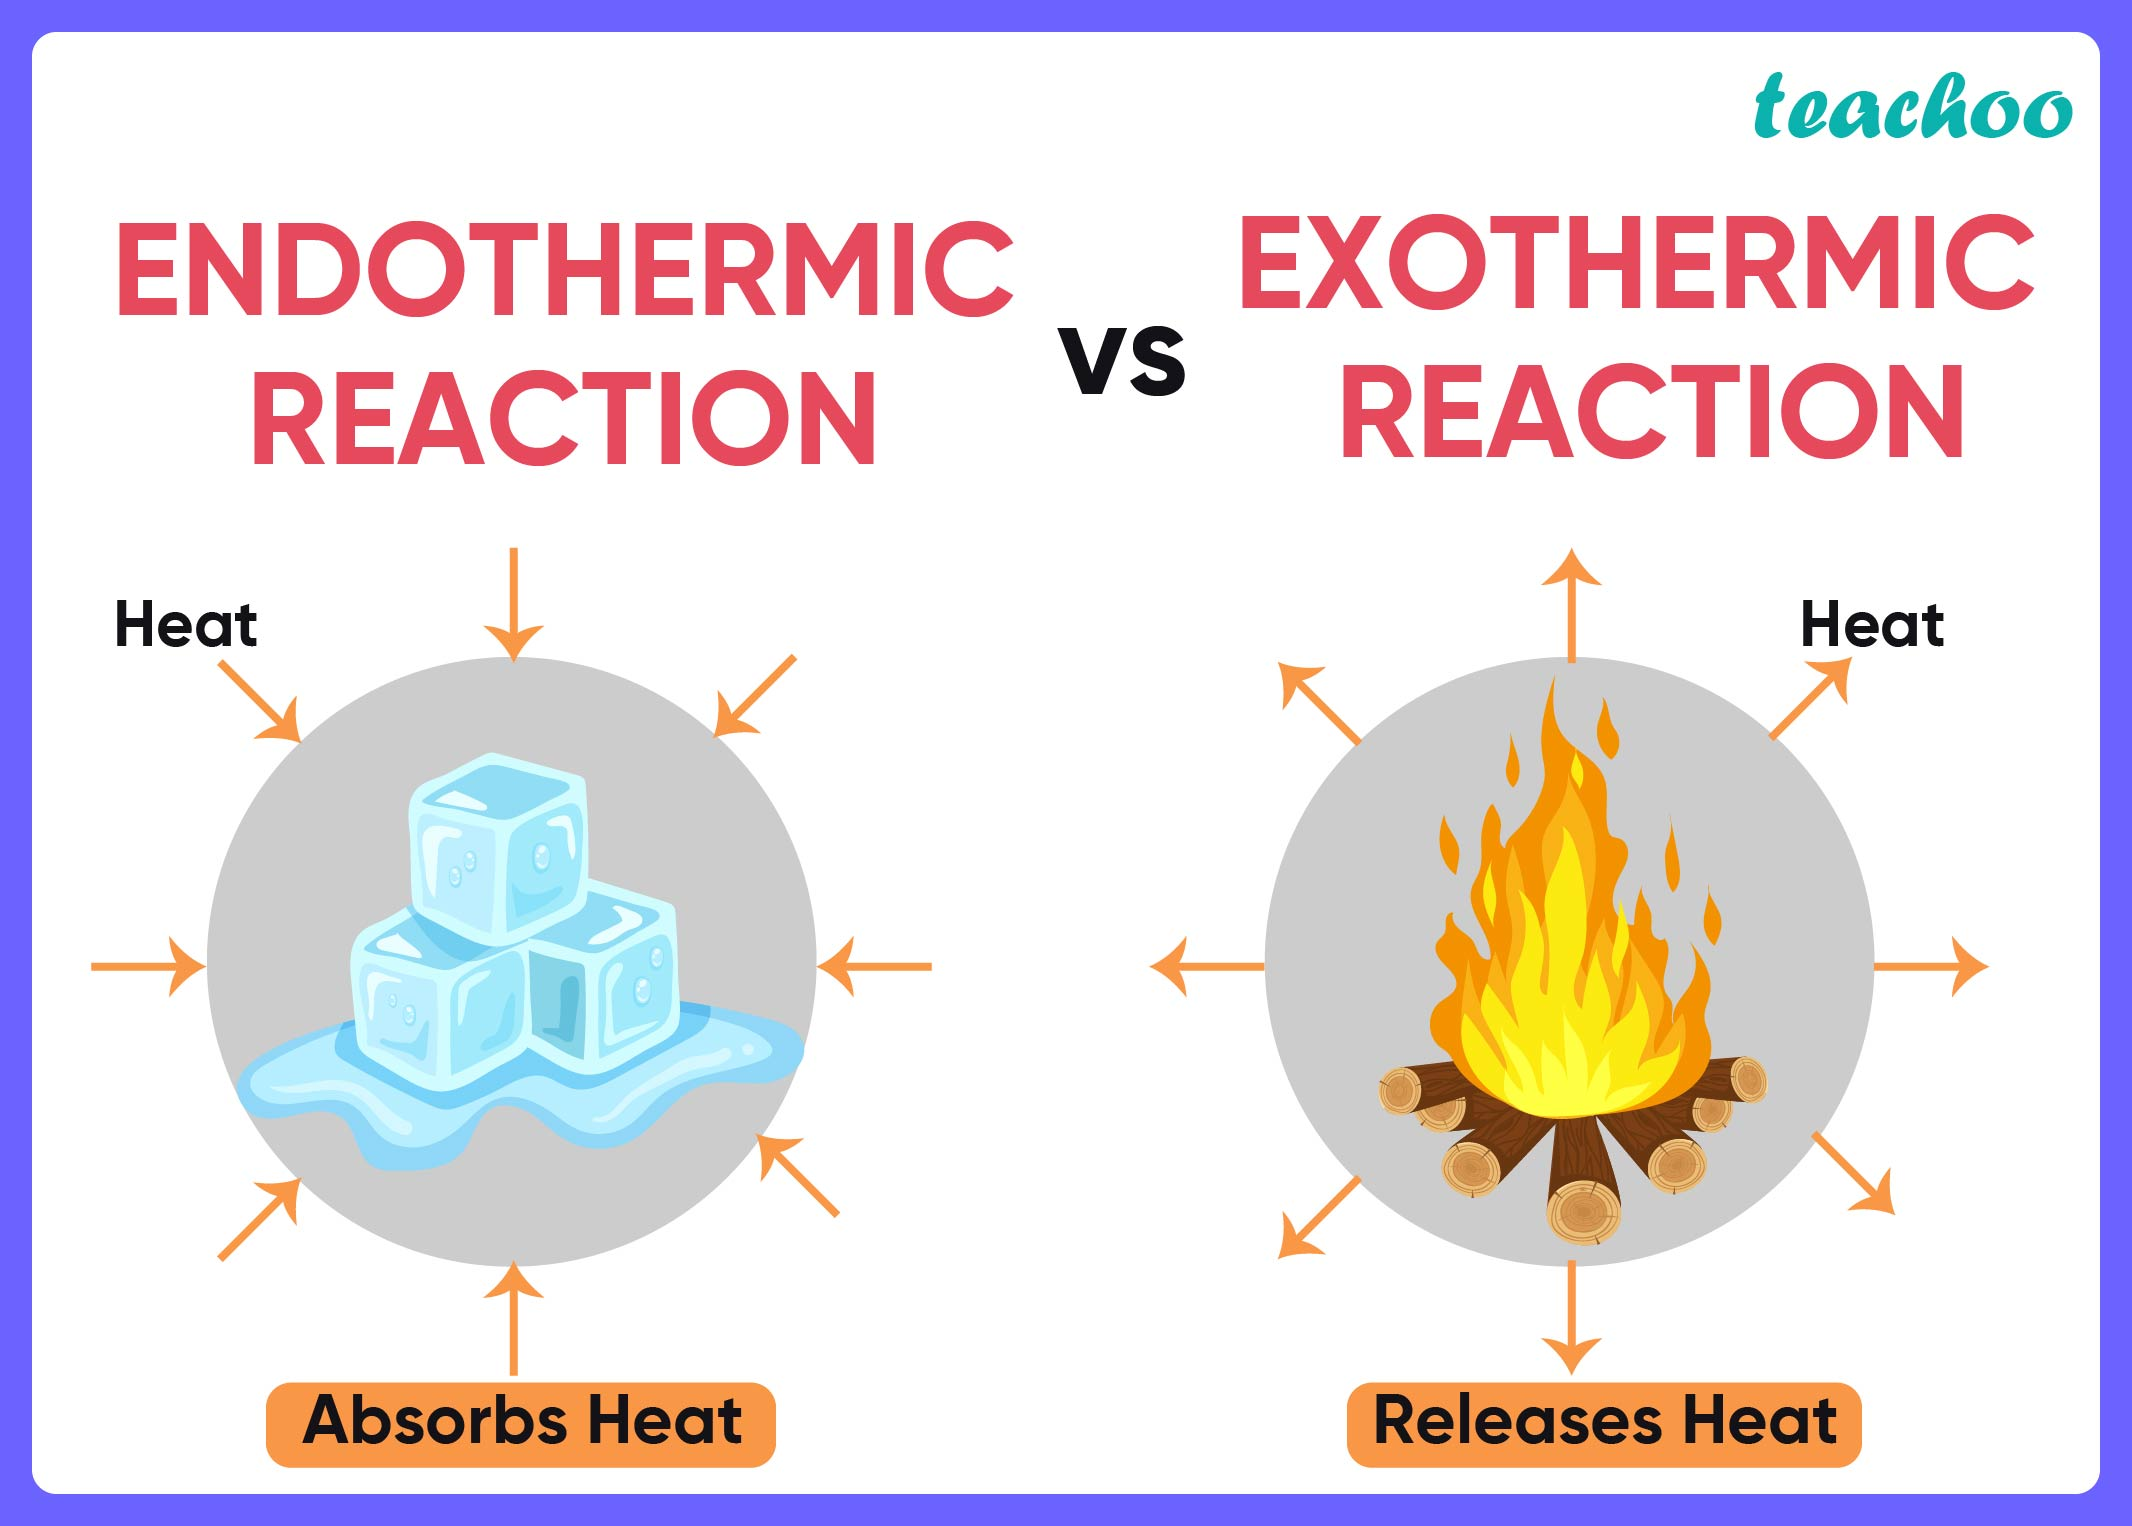 Endothermic vs Exothermic Reaction-01.jpg